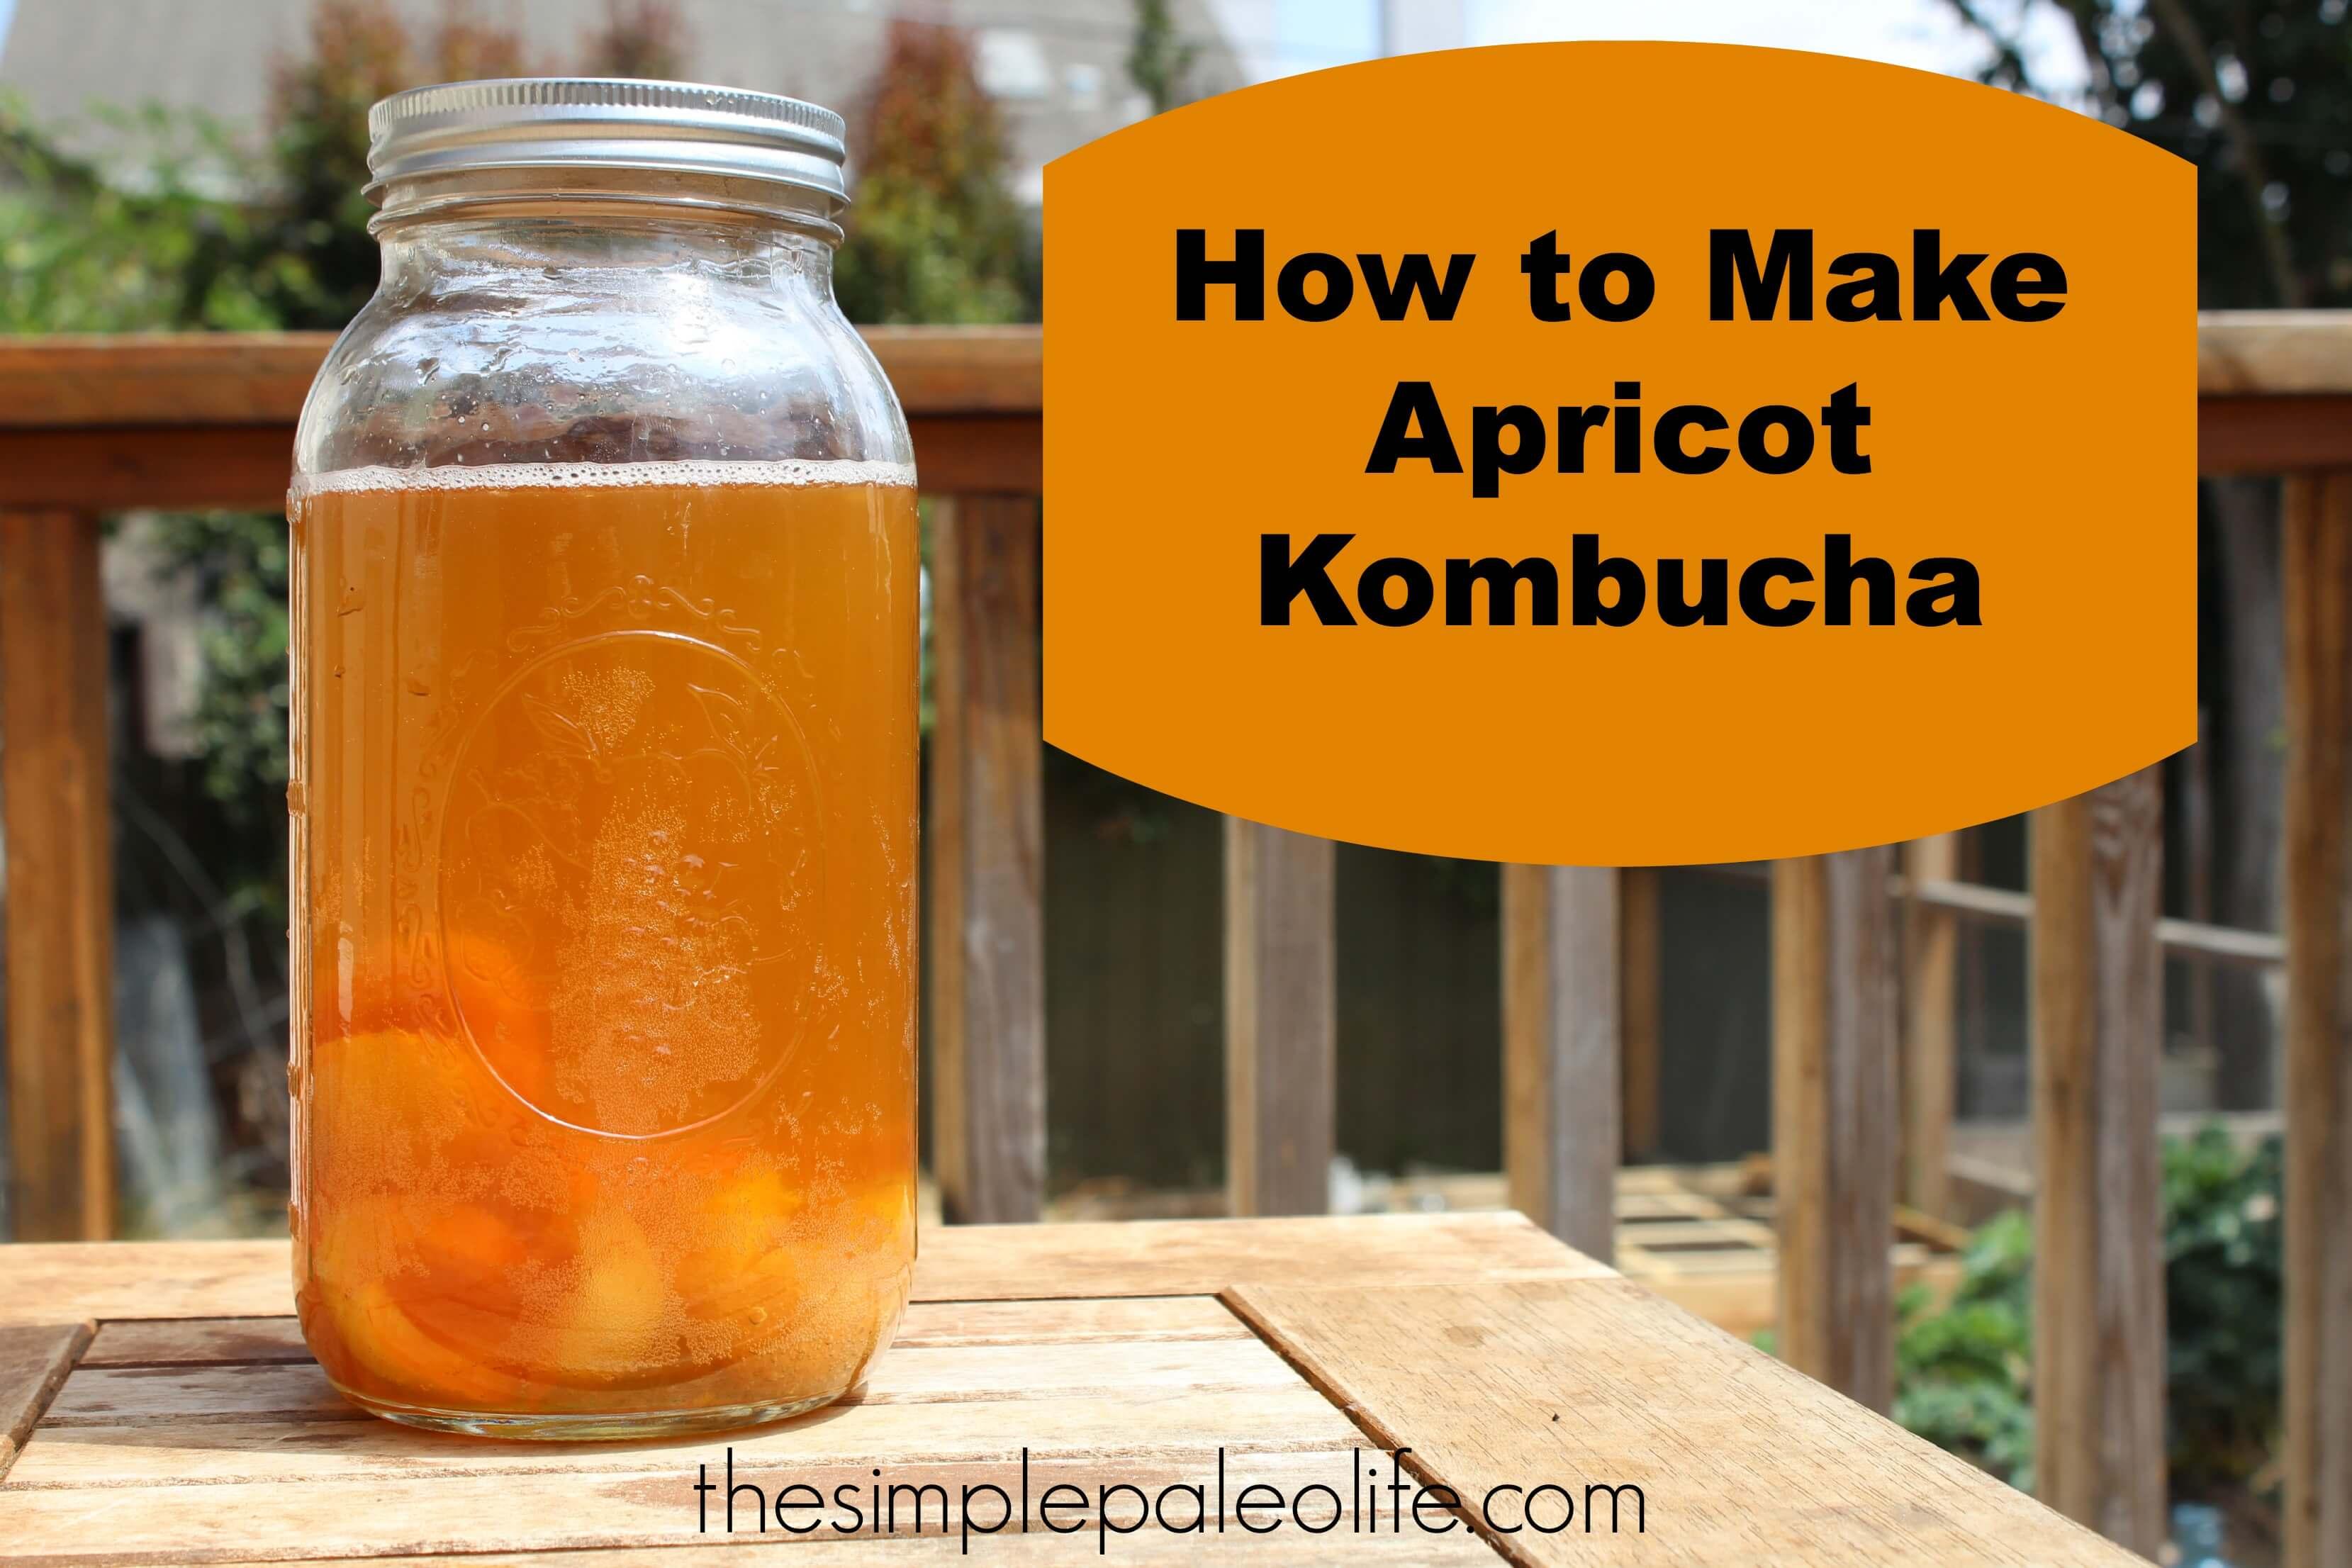 how to make the perfectberry kombucha